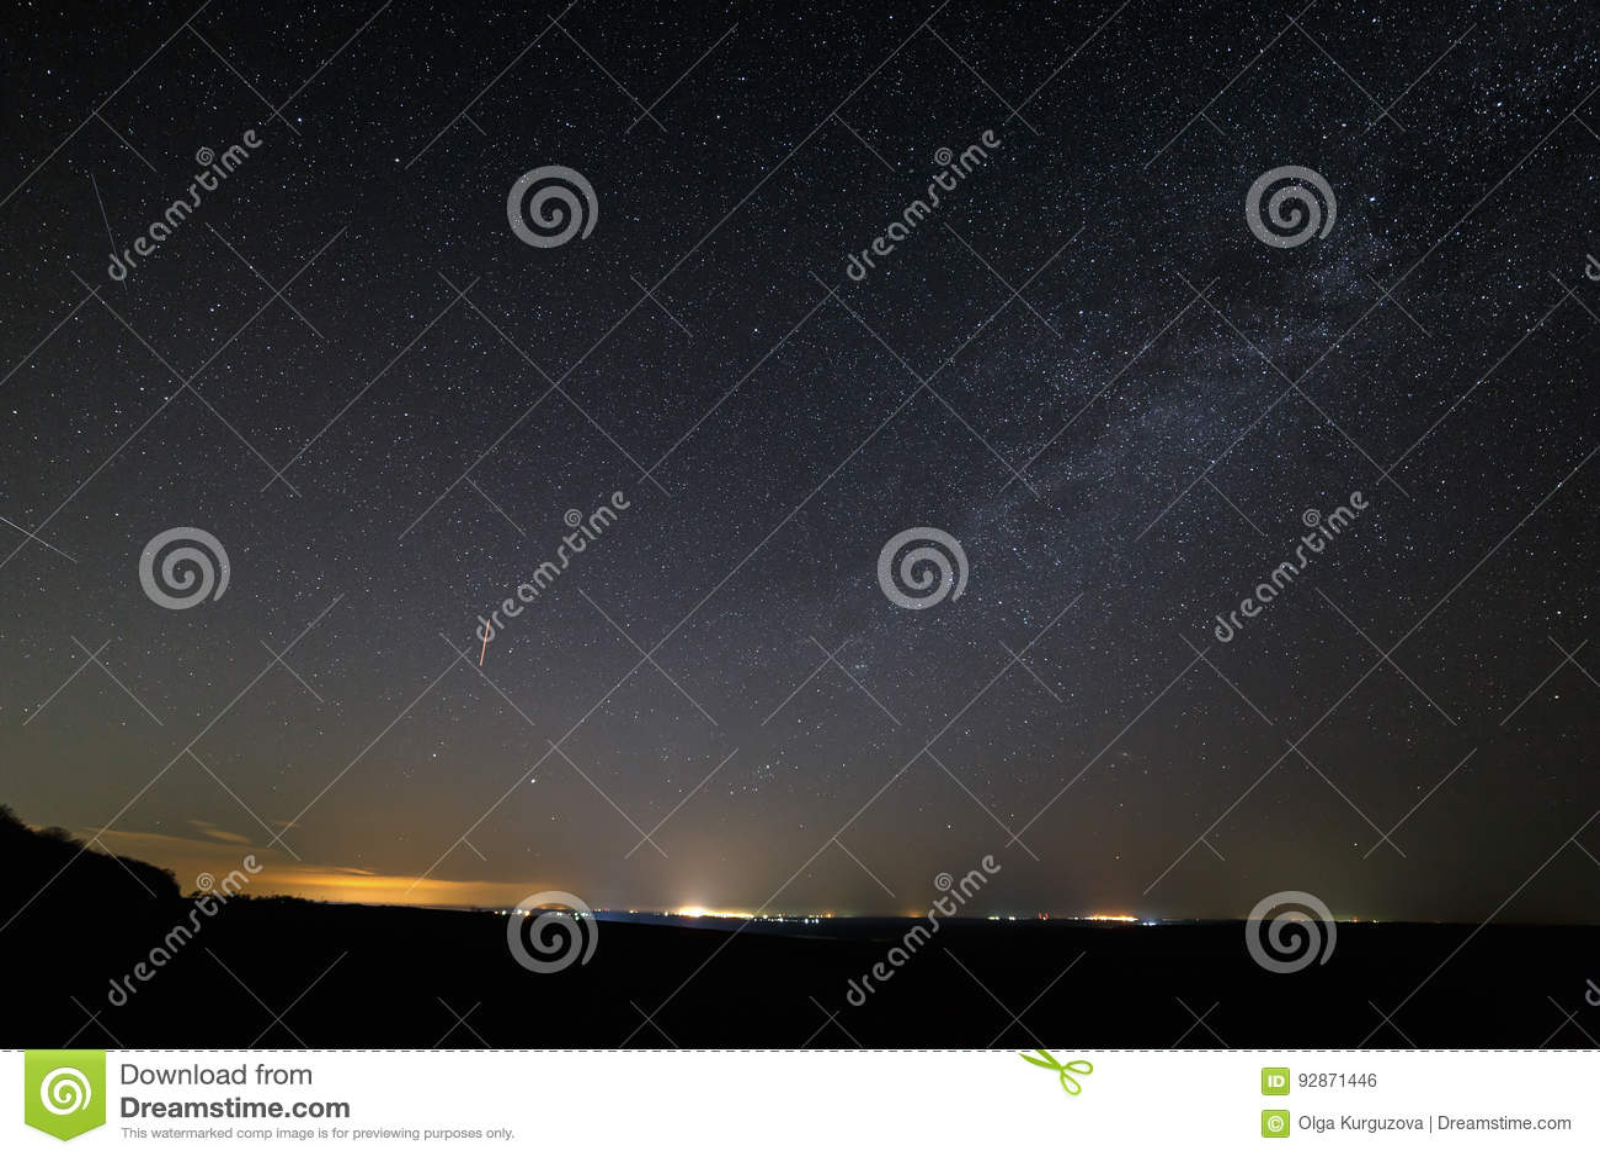 Stars in dark night sky with city lights on the horizon.